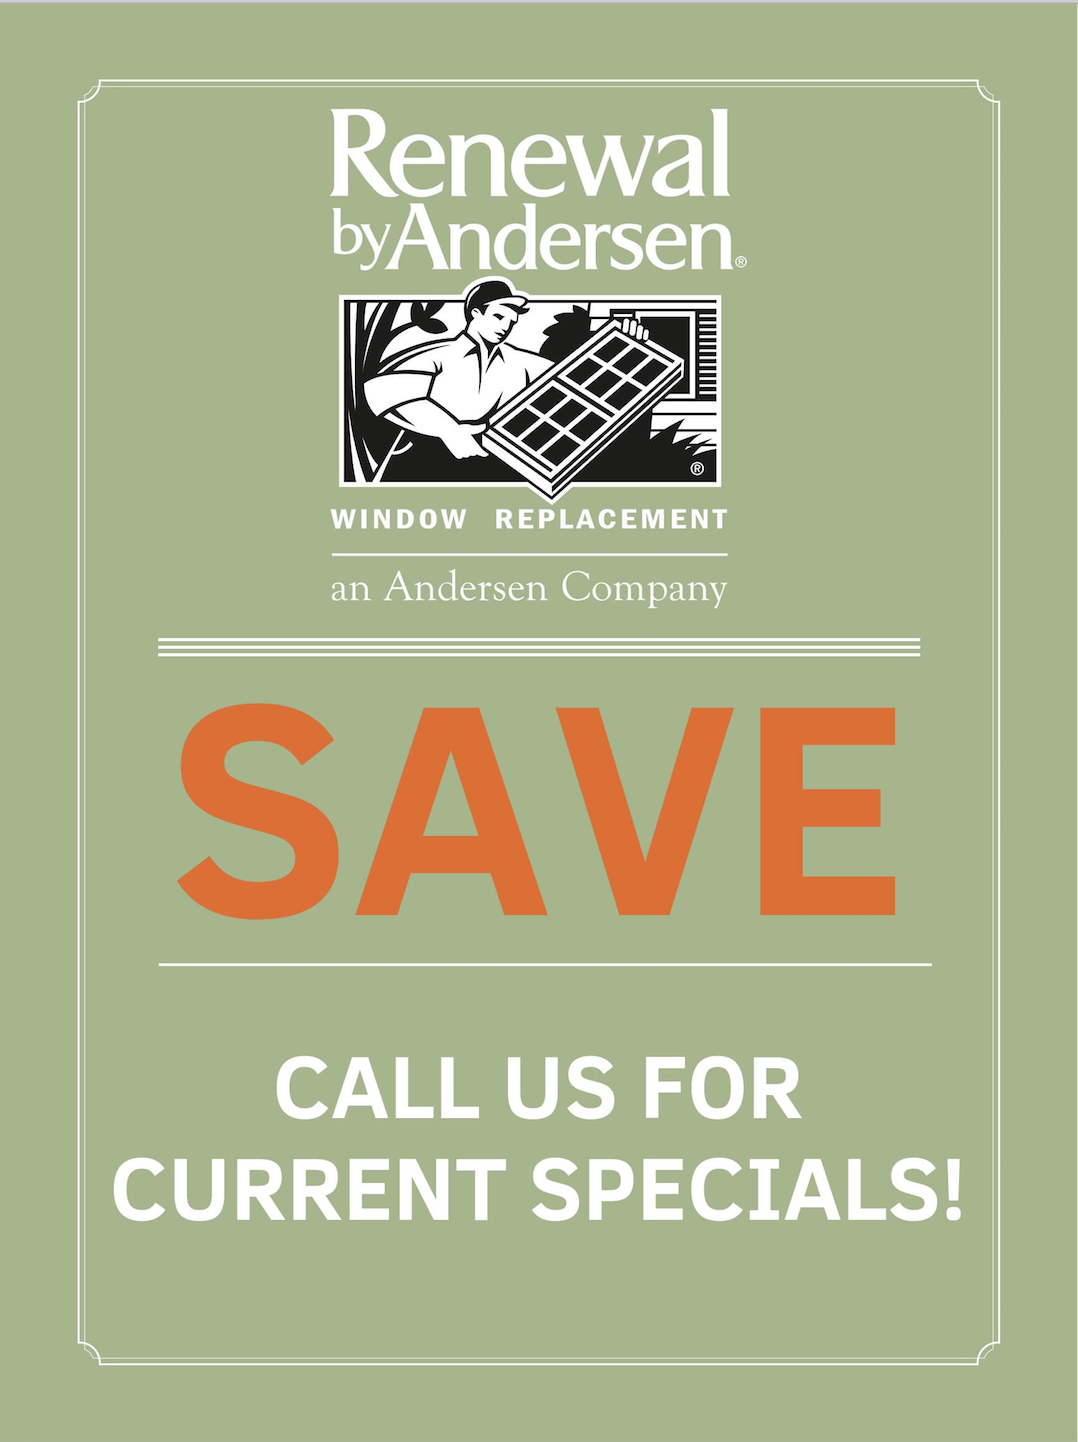 Renewal by Andersen Windows Lansing, MI | Window Replacement & Patio on